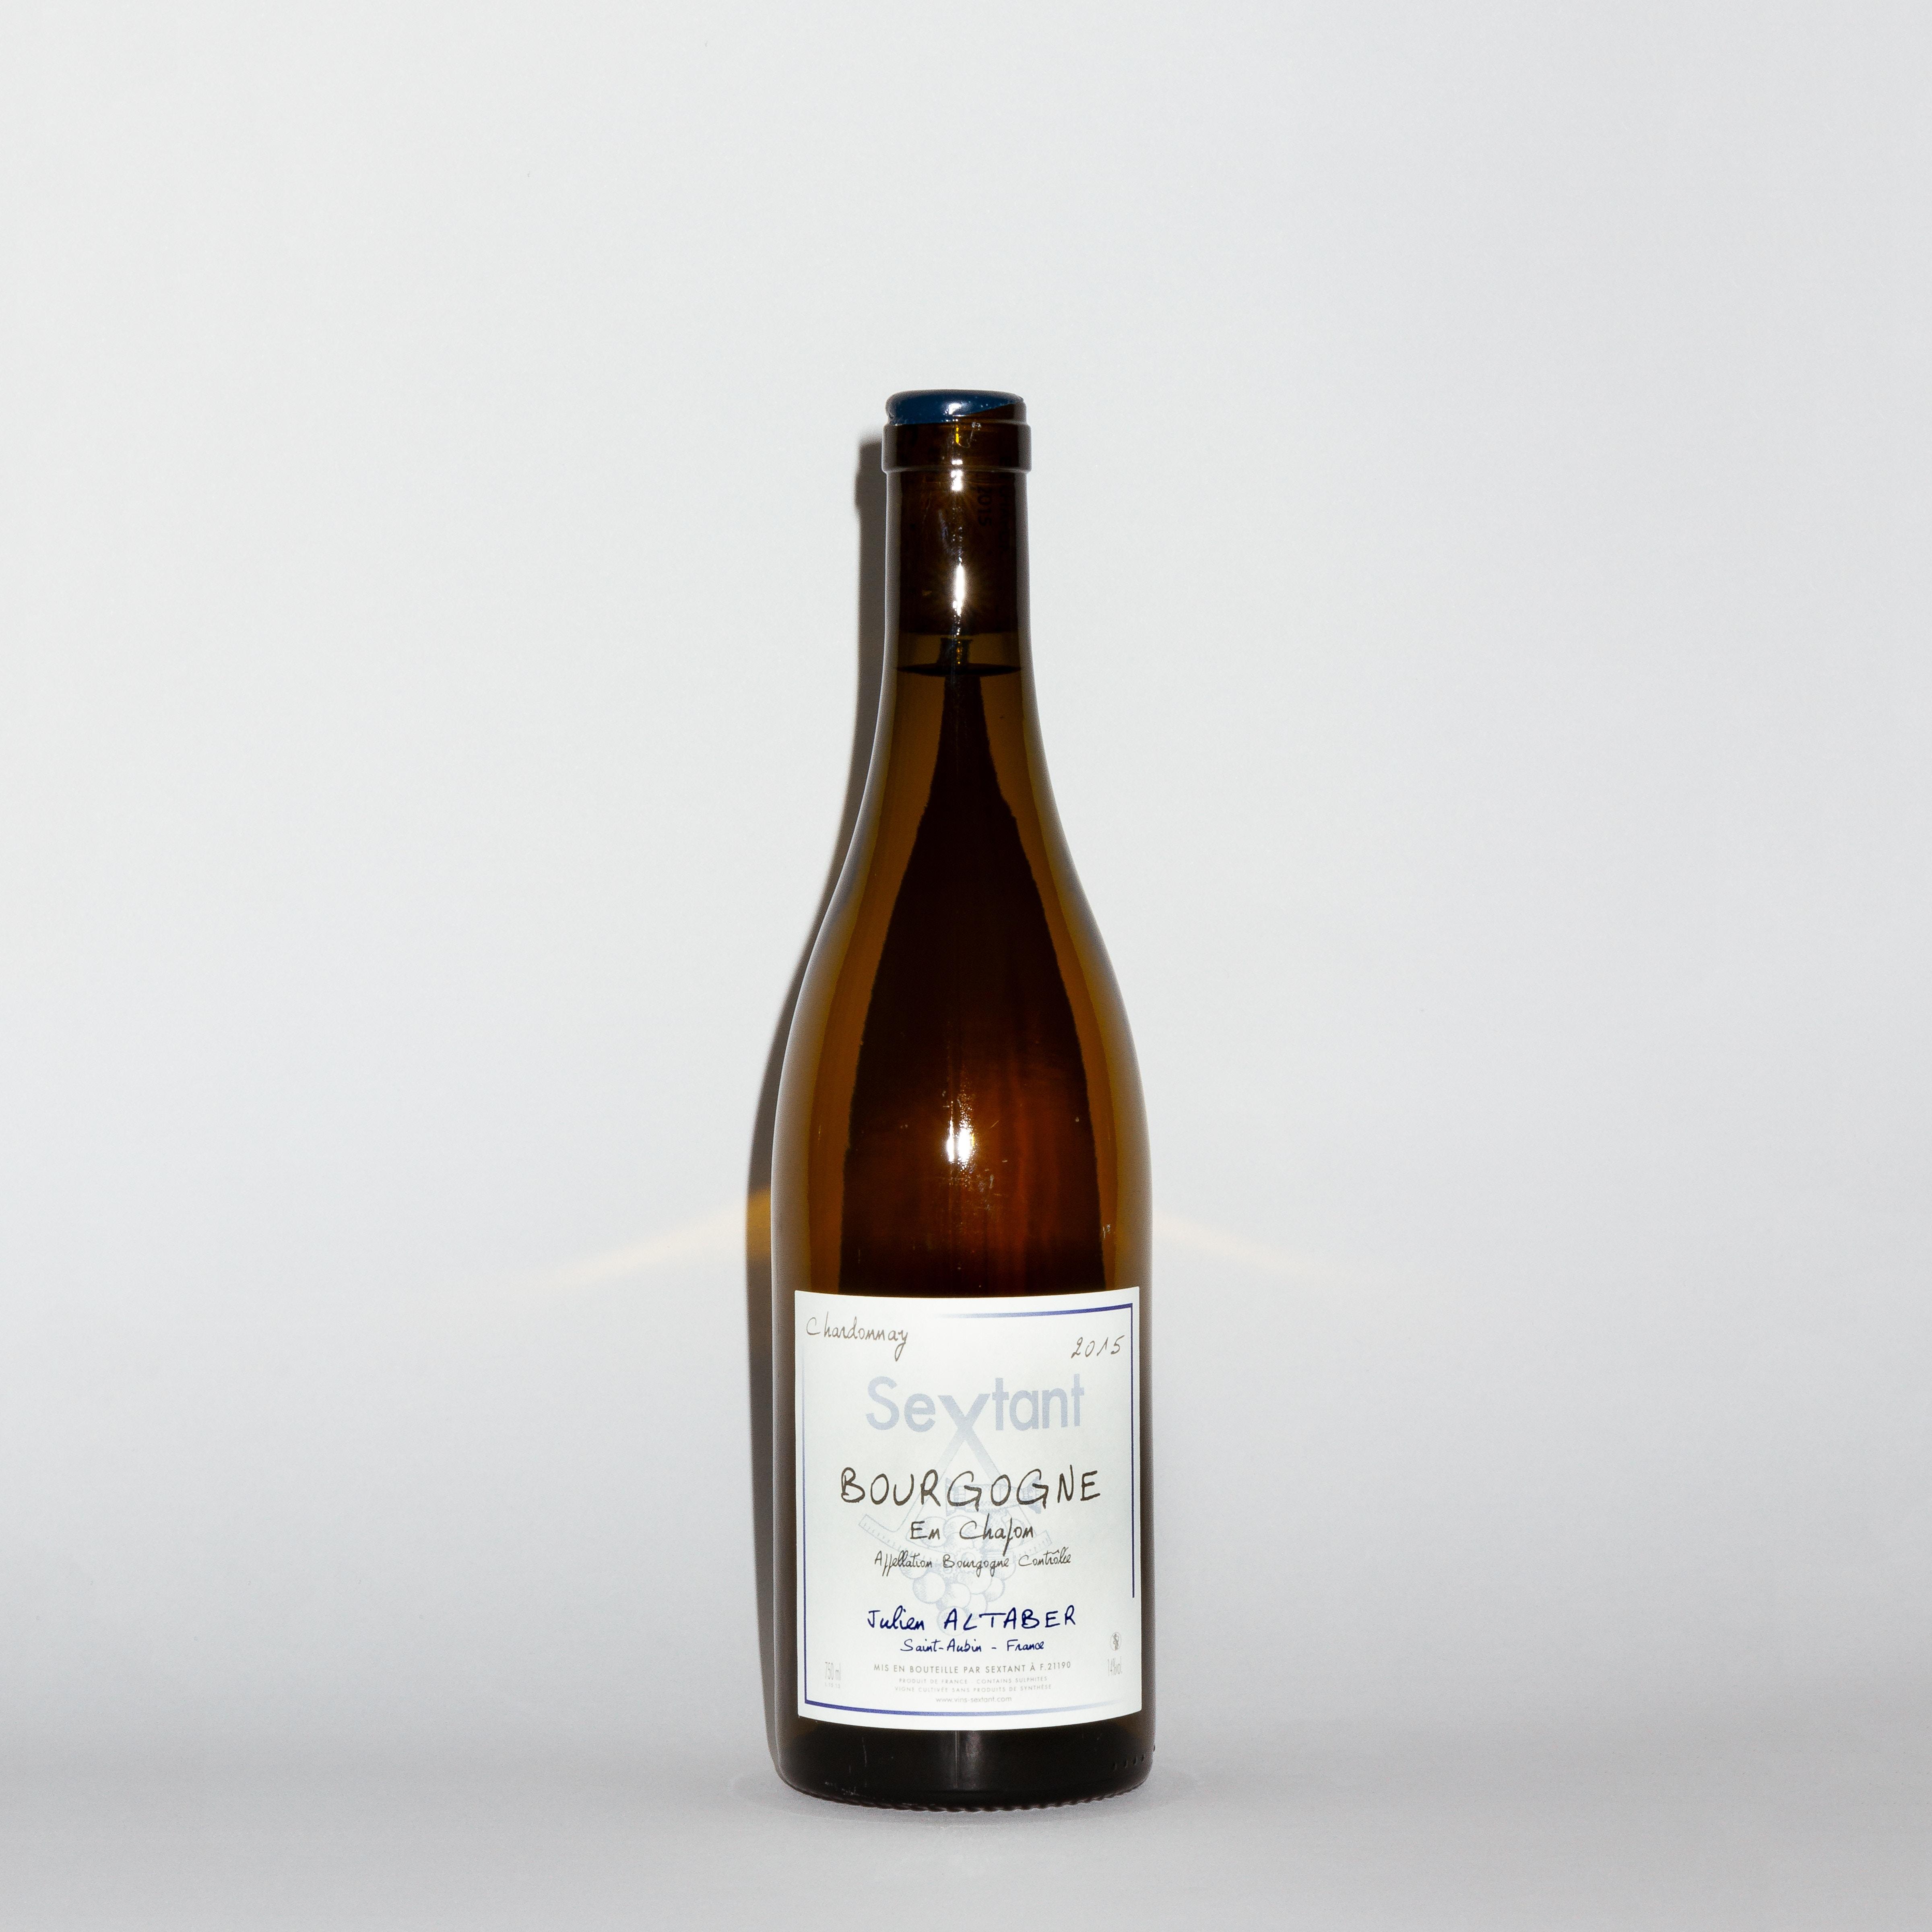 Bourgogne Blanc 'En Chapon' 2015 by Sextant Julien Altaber